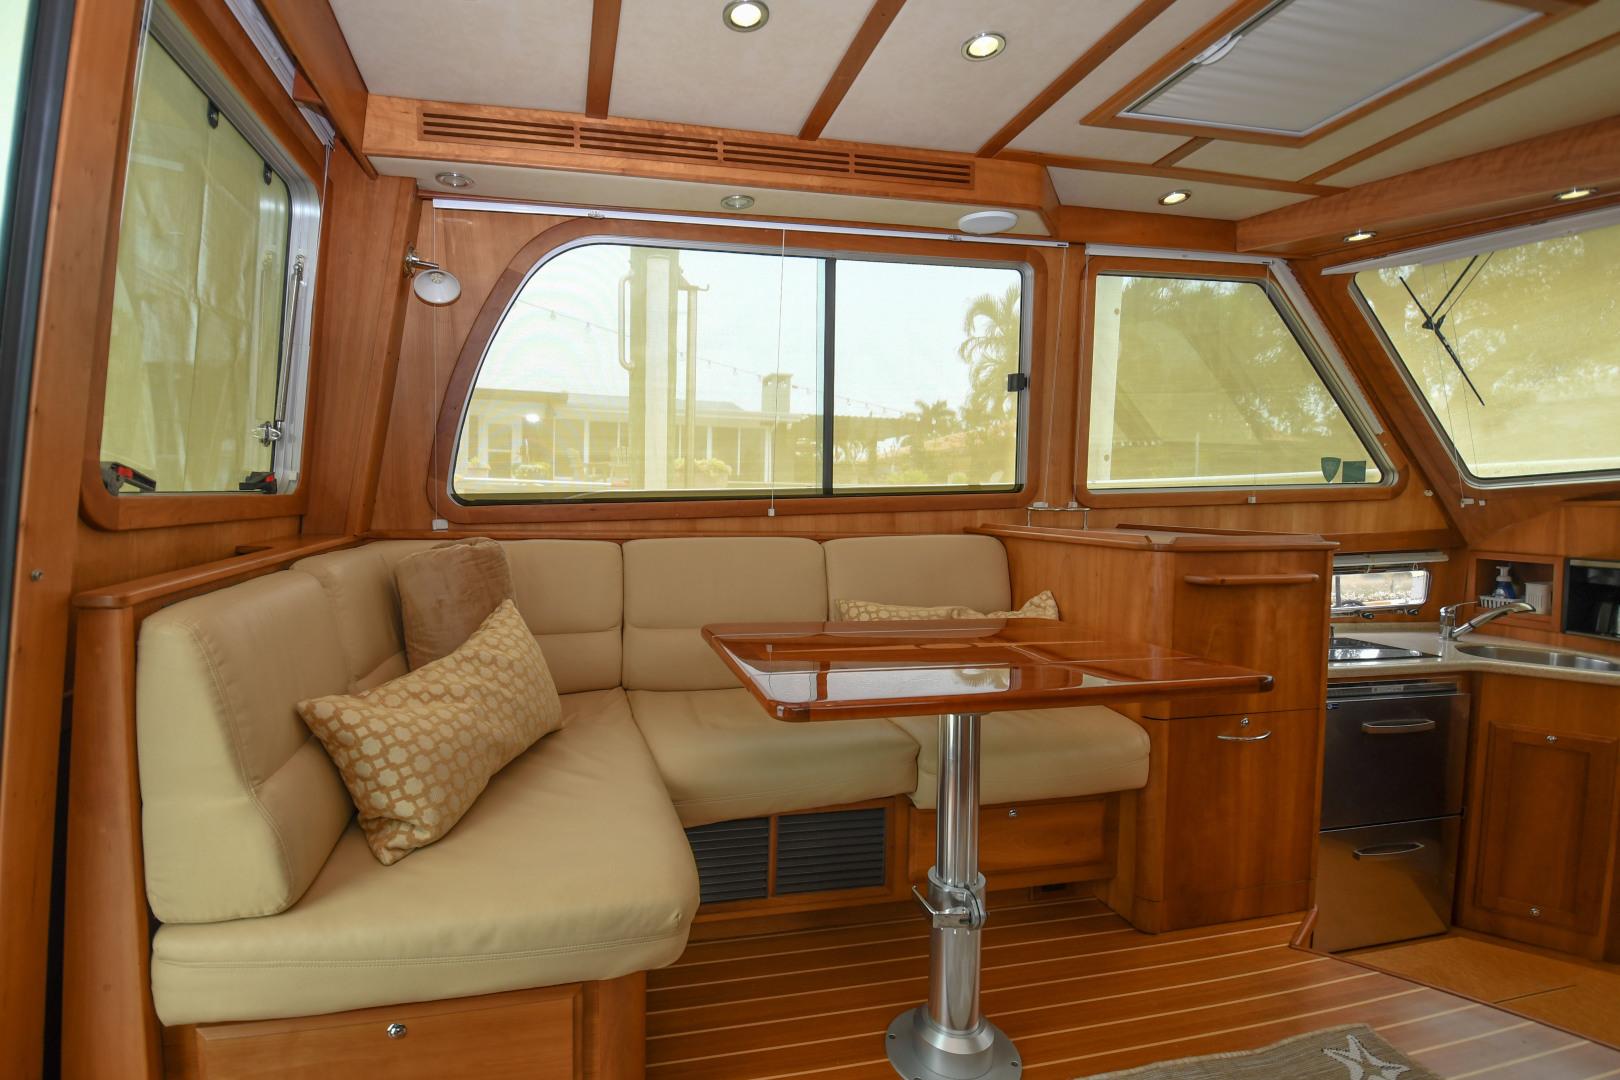 Sabre-40 Express 2010-Impulse Treasure Island-Florida-United States-2010 40 Sabre Express  Impulse  Companion Seating-1618629 | Thumbnail